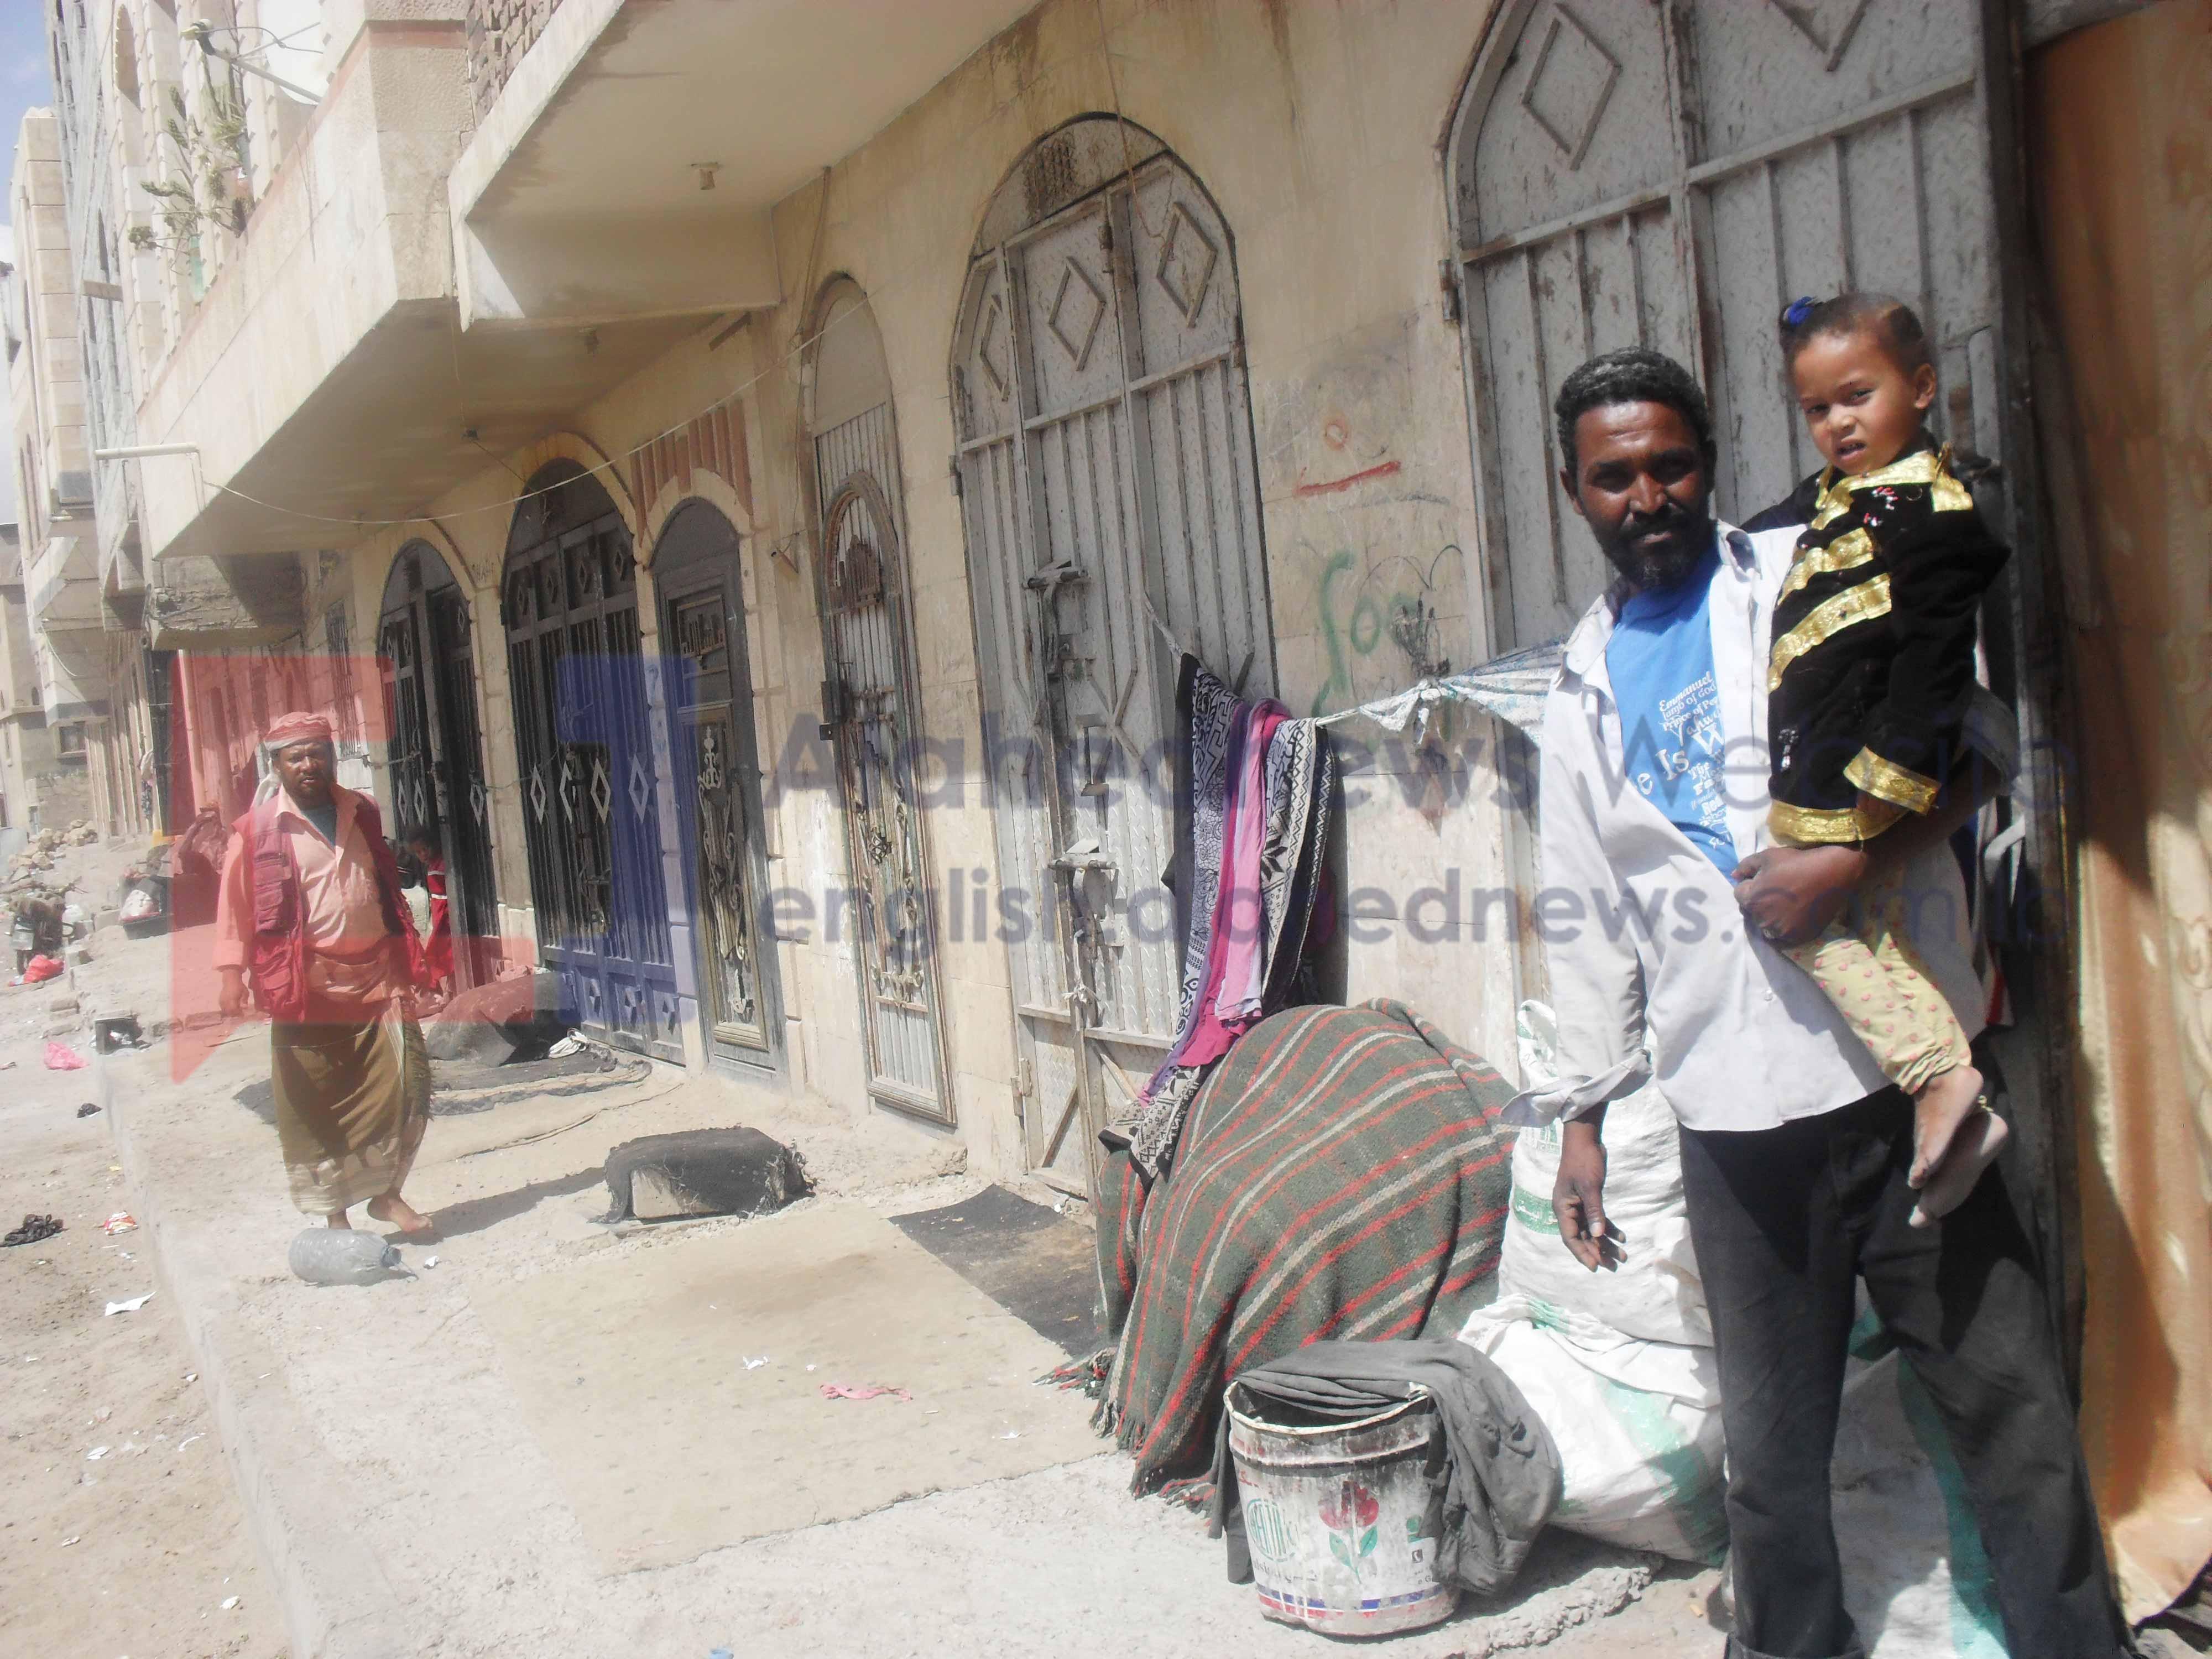 The Plight of the Internally Displaced Yemenis in Sanaa